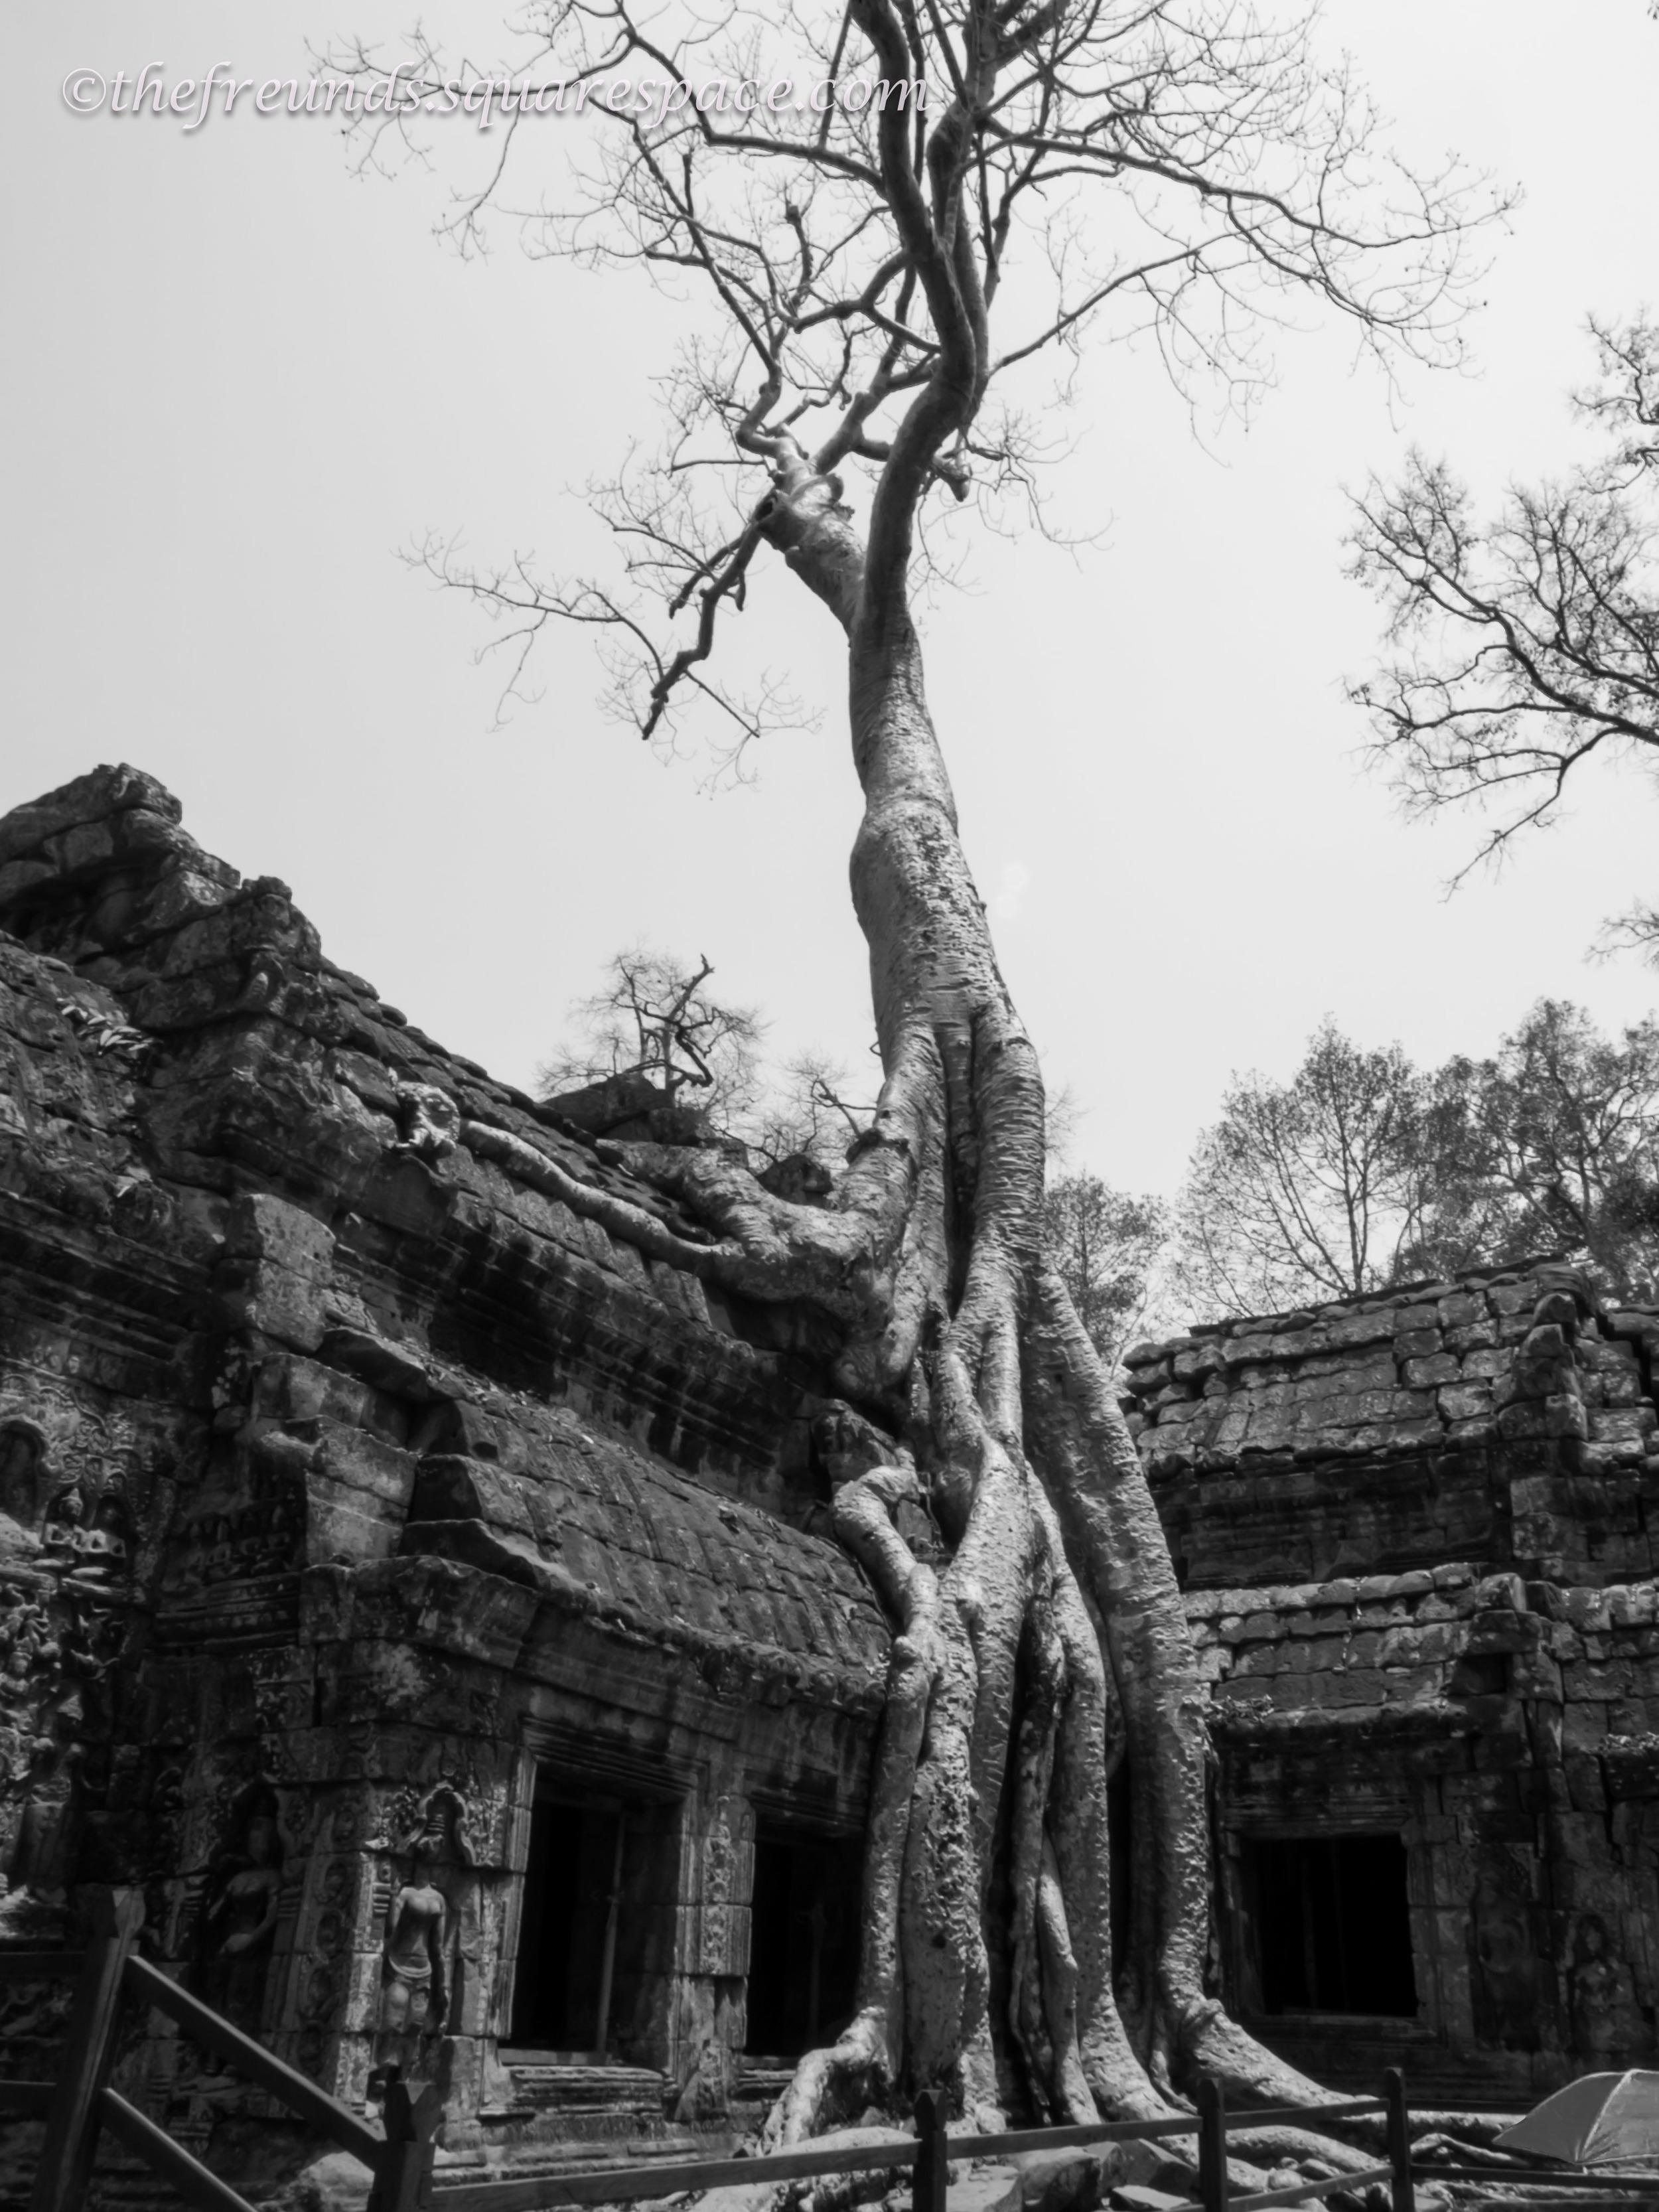 Angkor_SiemReap-31.jpg